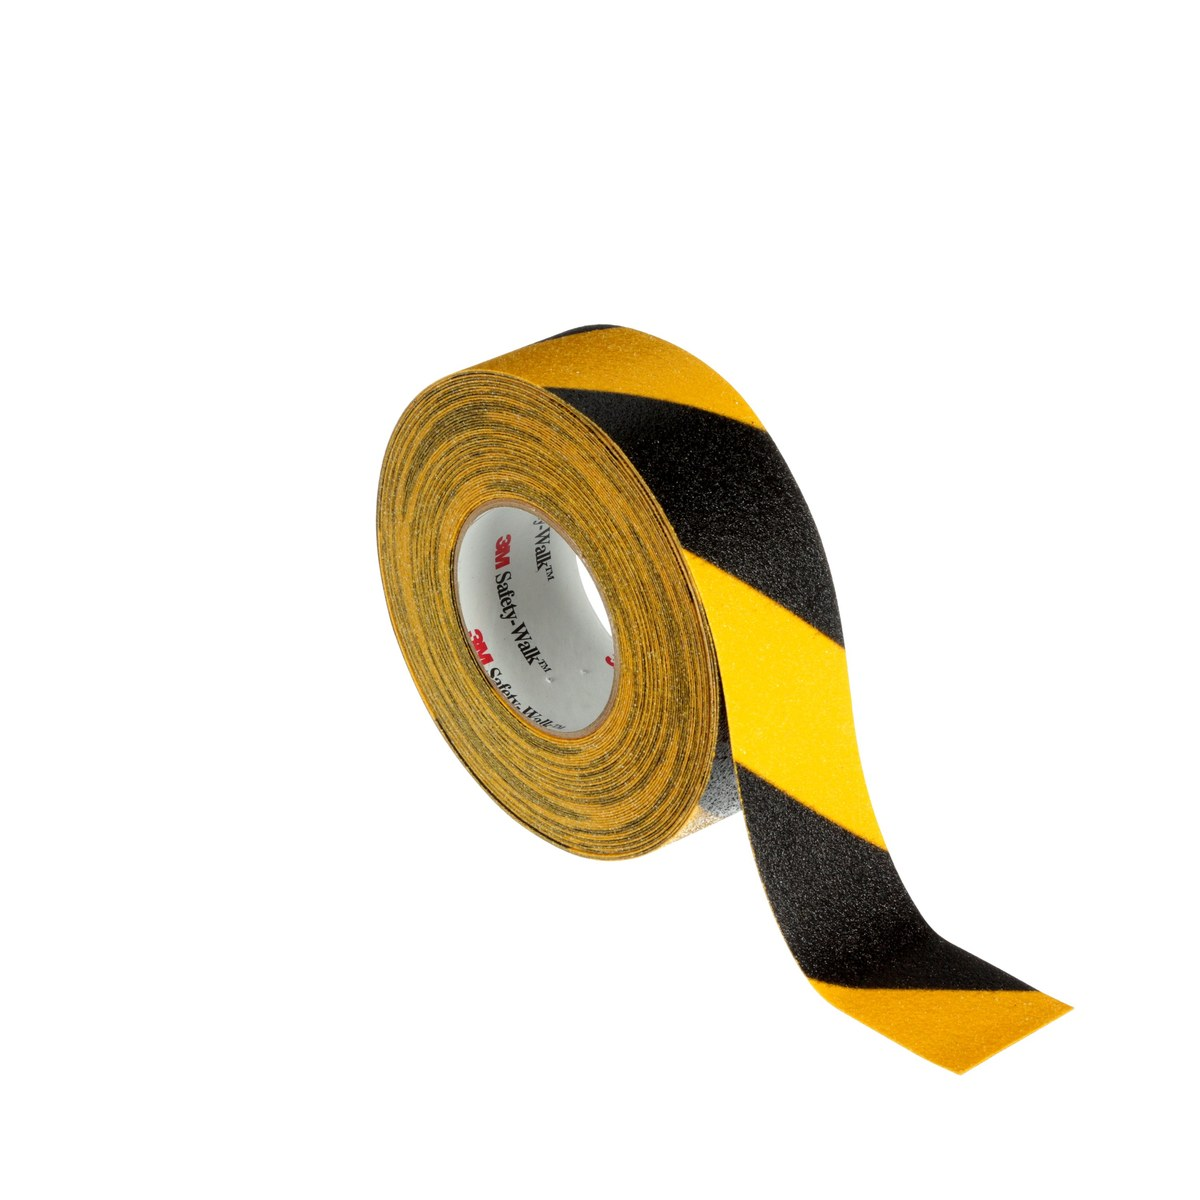 3M Safety-Walk Slip Resistant Tape